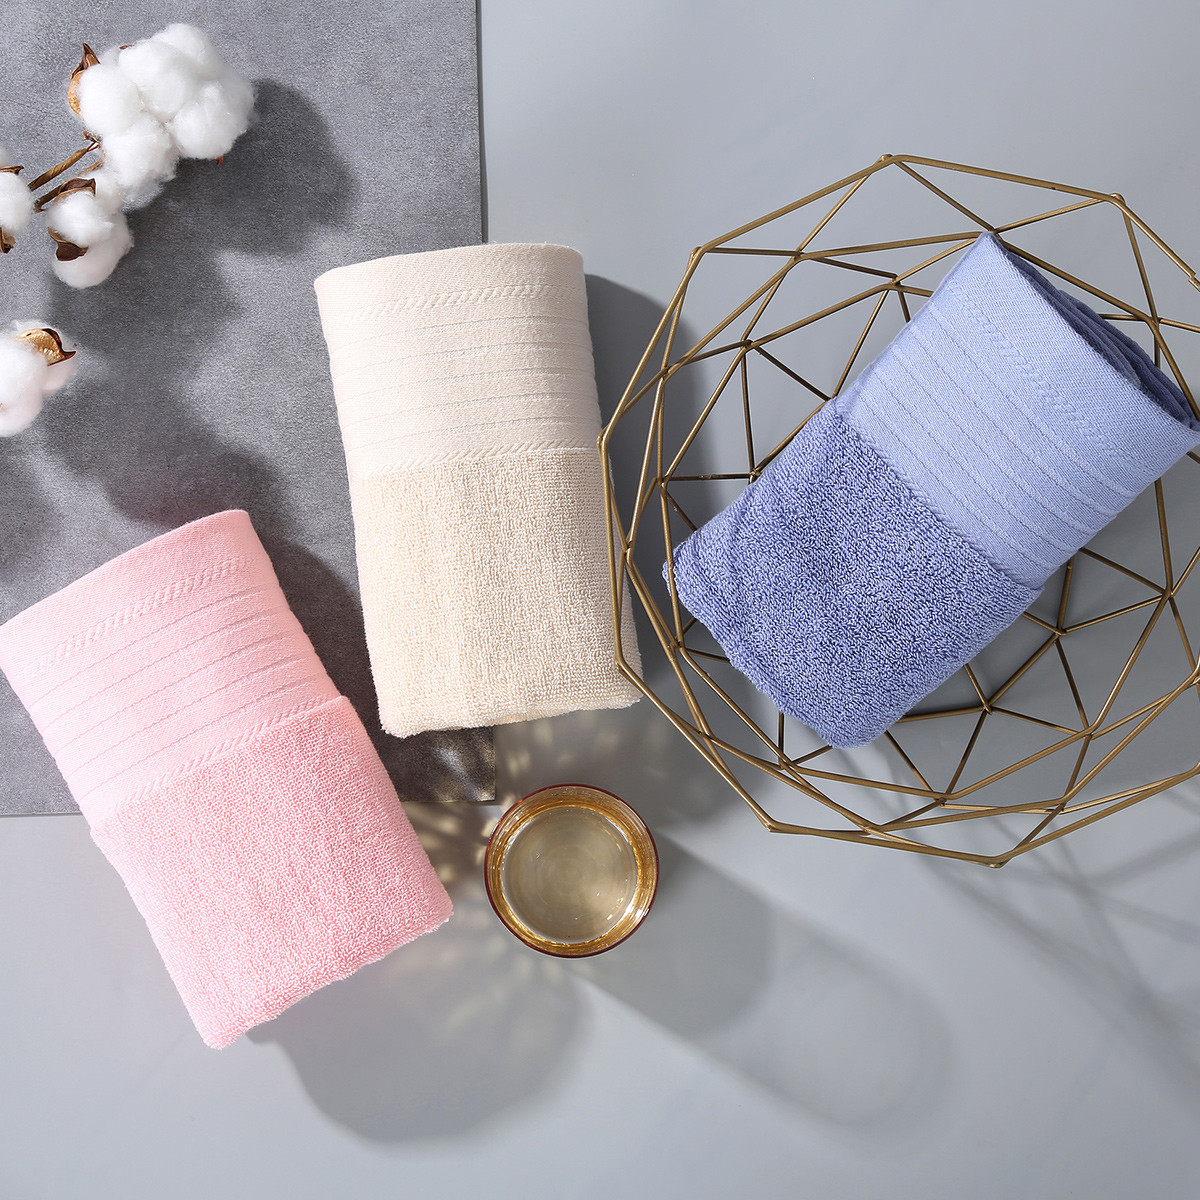 Ramada全棉家用加厚吸水成人洁面巾洗脸毛巾洗澡巾毛巾面巾FT171048